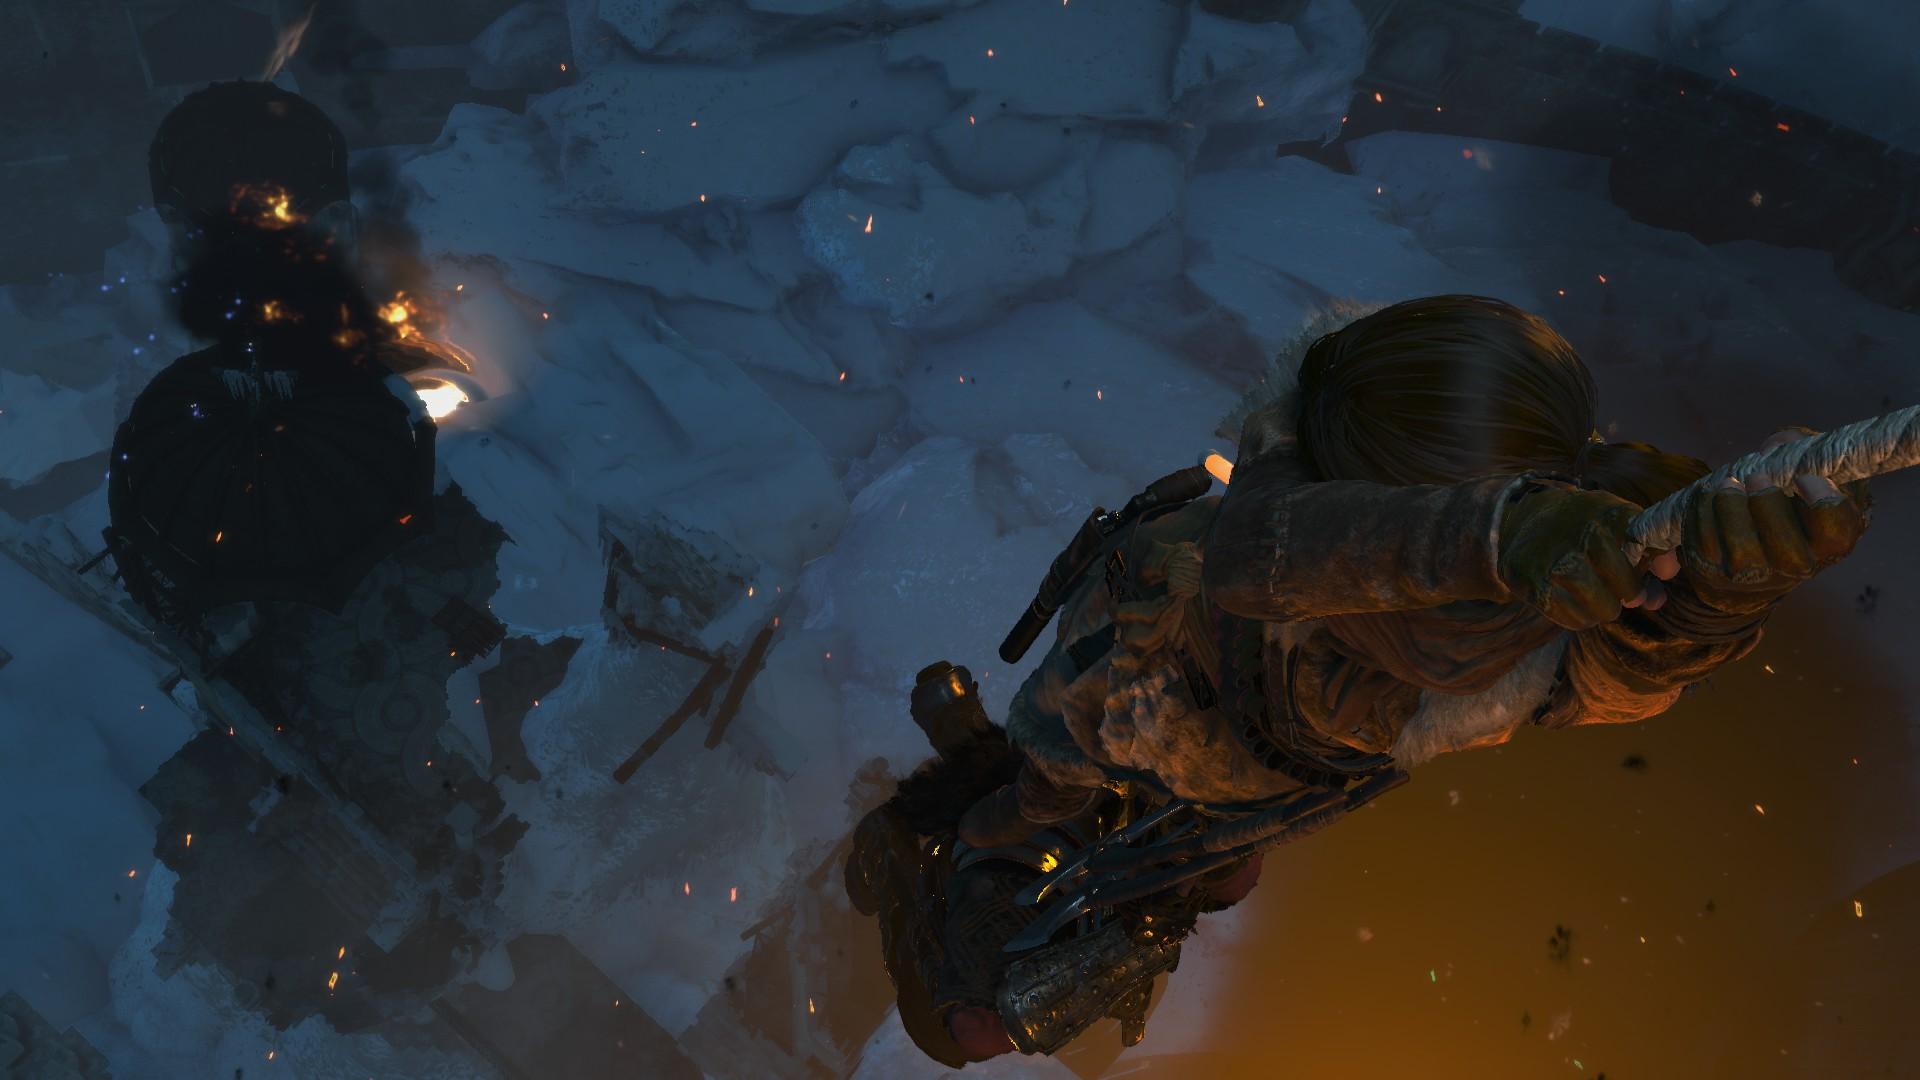 20180101133643_1.jpg - Rise of the Tomb Raider